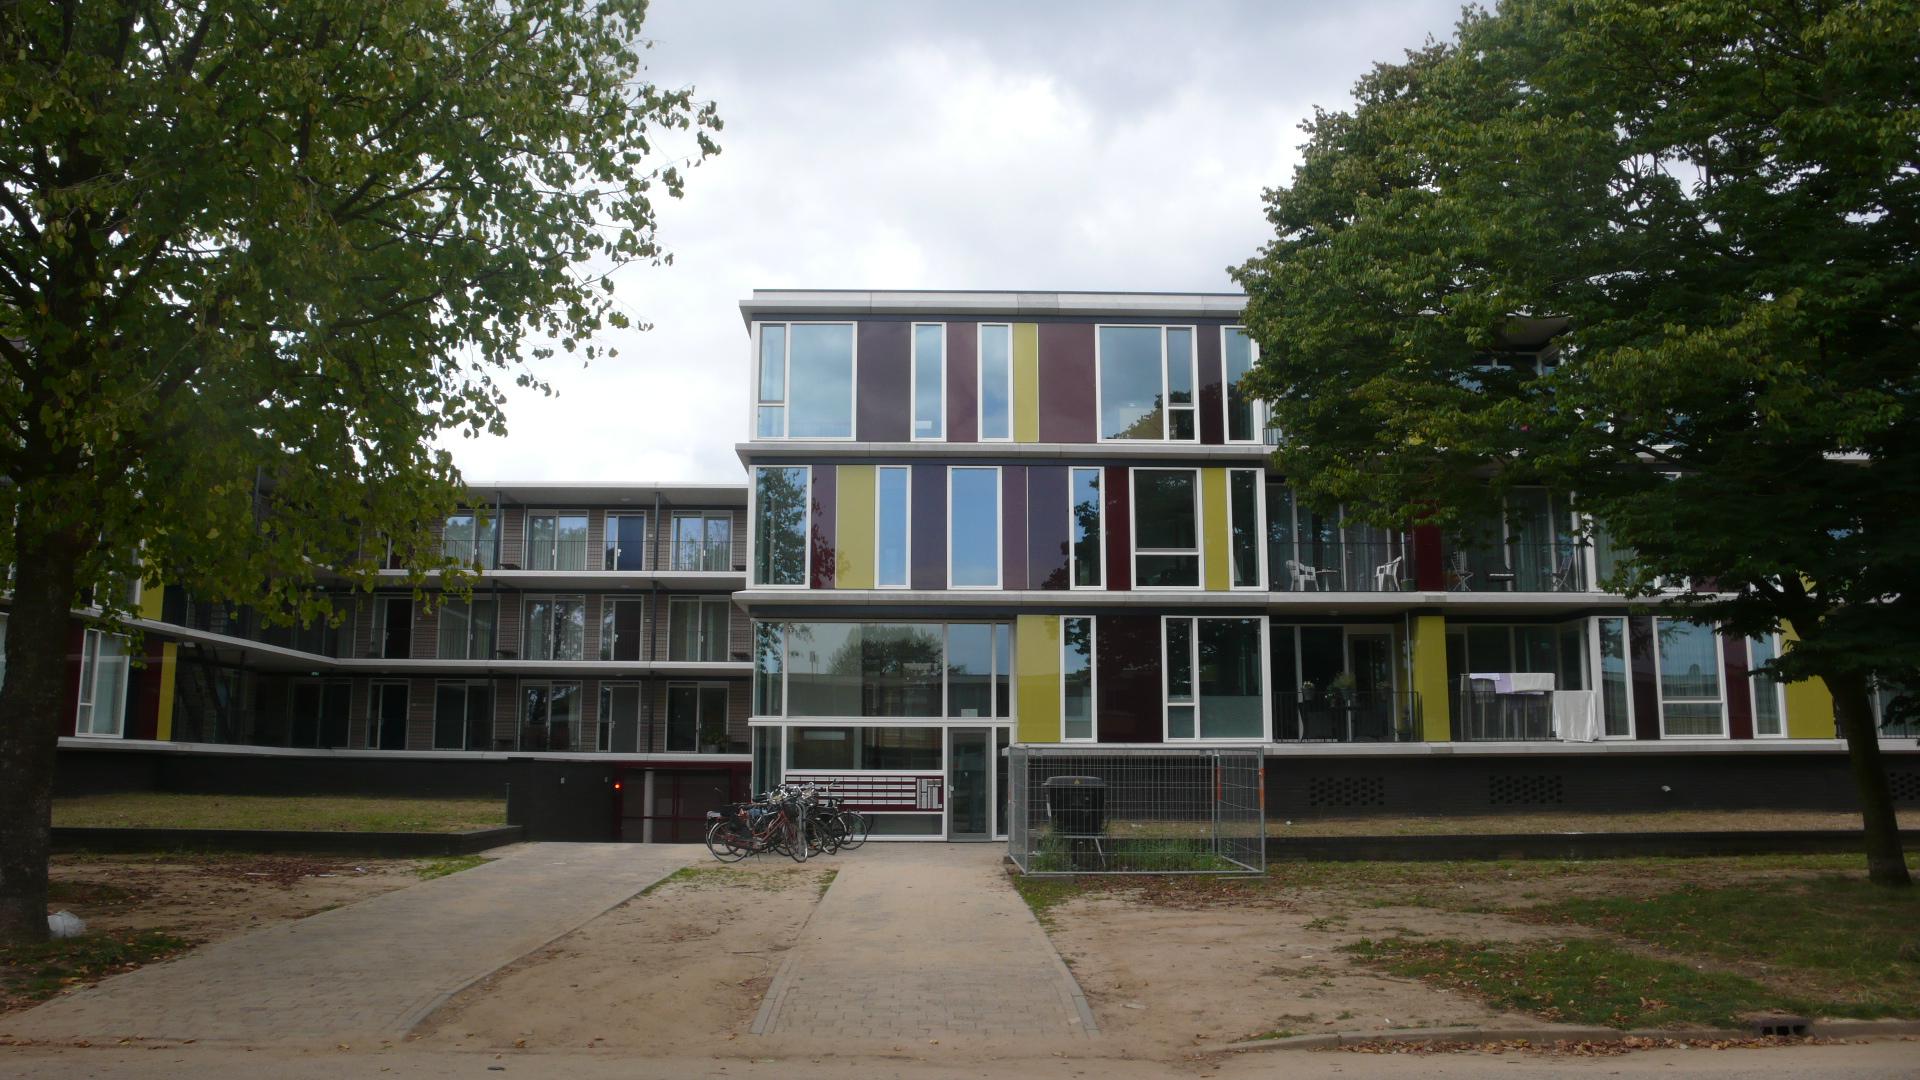 Cuijk Appartementen - De Architect